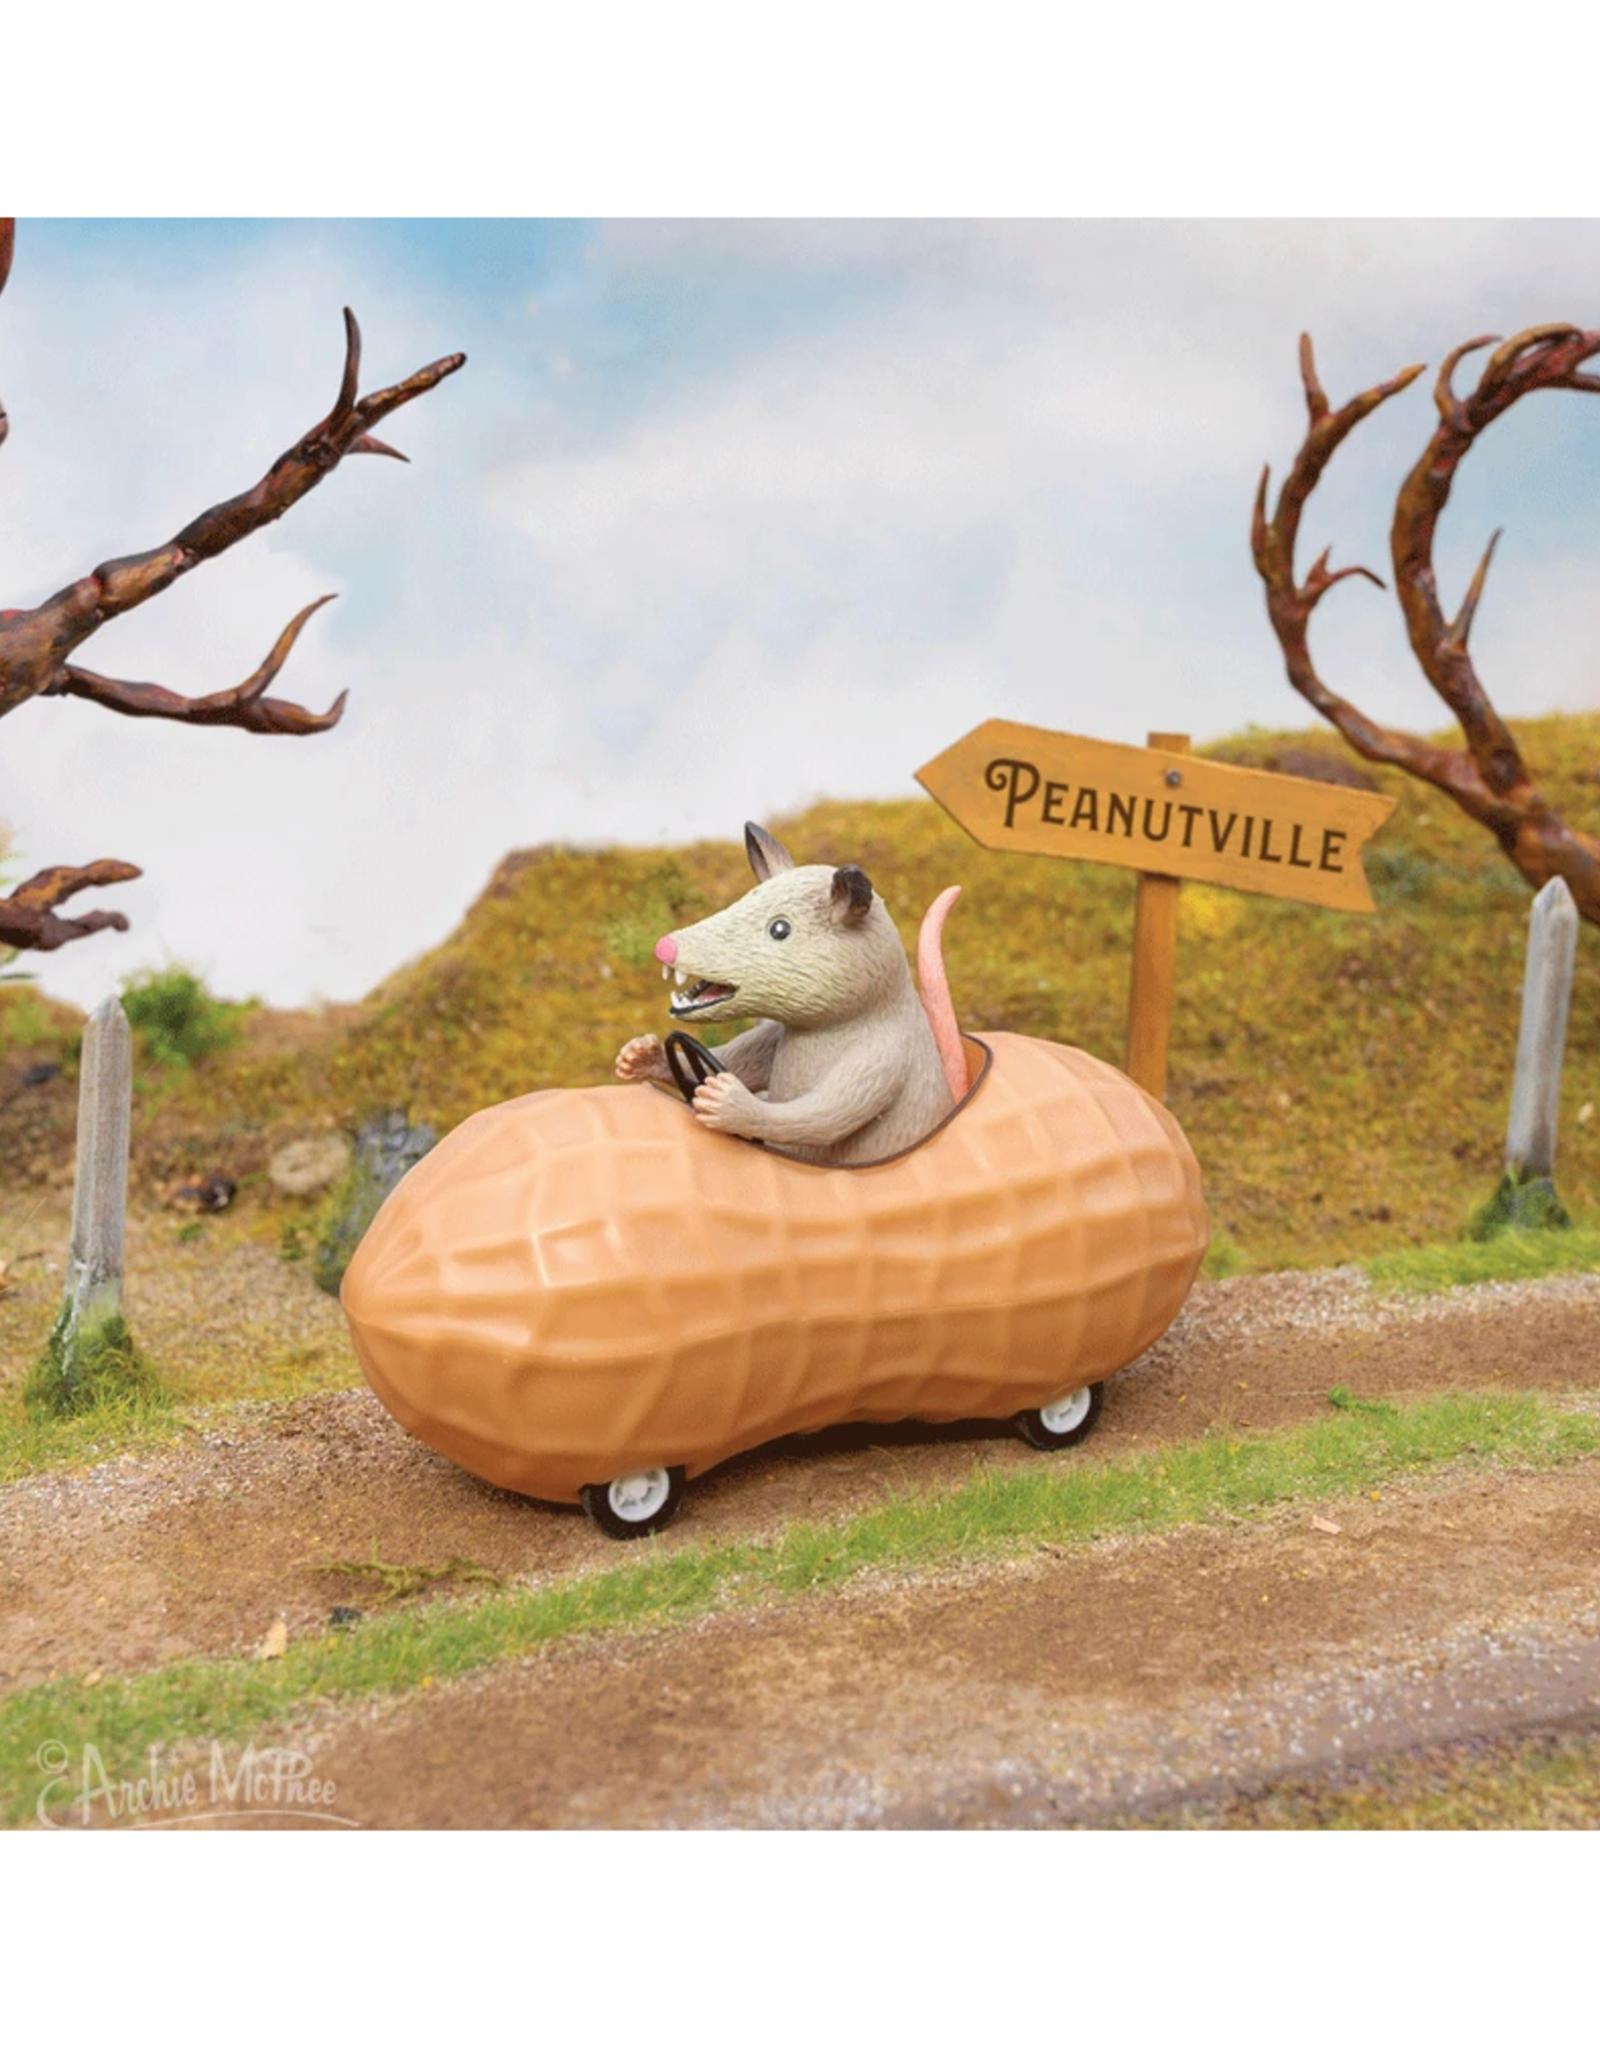 Racing Possum in a Peanut